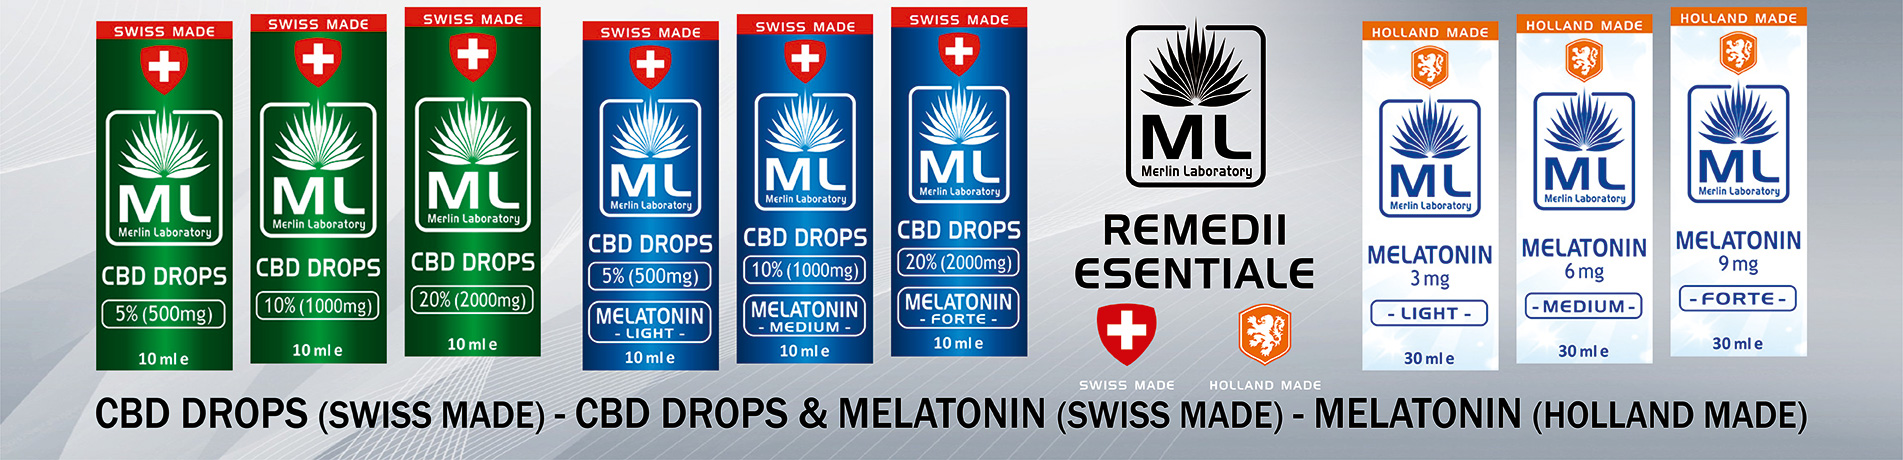 baner-uleiuri-remedii-esentiale-cbd-drops-melatonina_SWISS-HOLLAND-MADE_Laboratoarele-Merlin